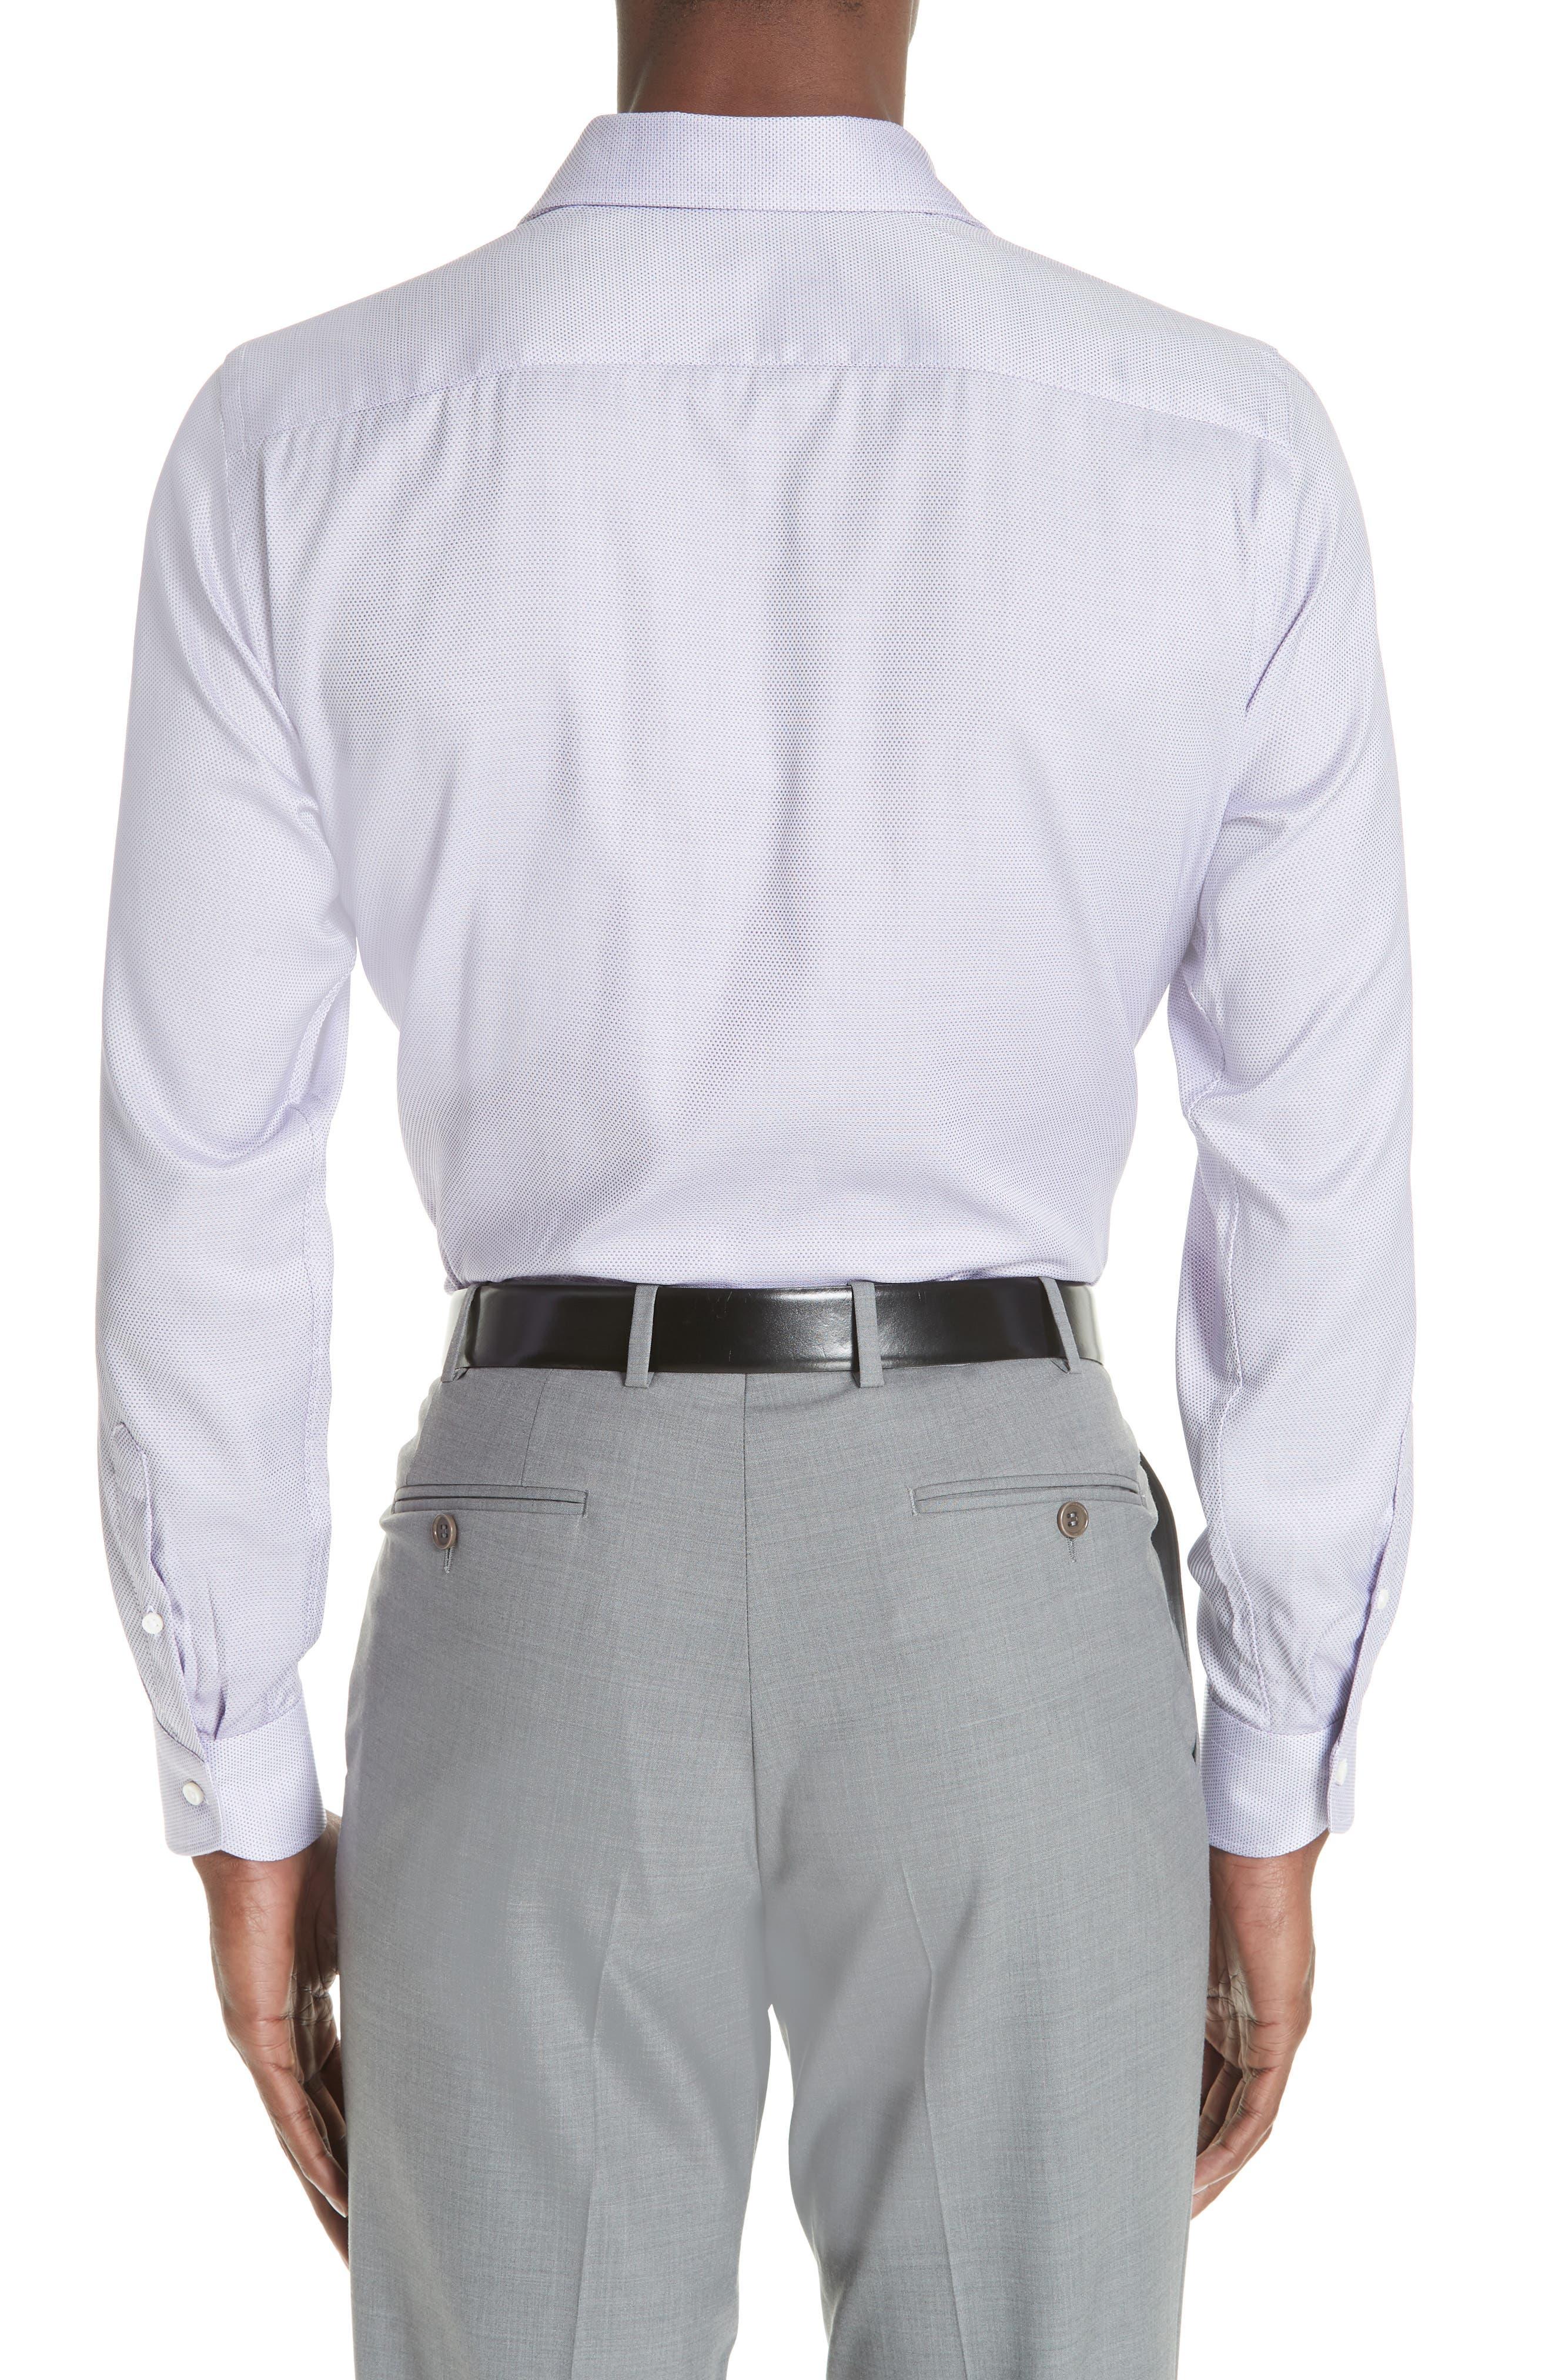 Trim Fit Dress Shirt,                             Alternate thumbnail 3, color,                             LIGHT PURPLE